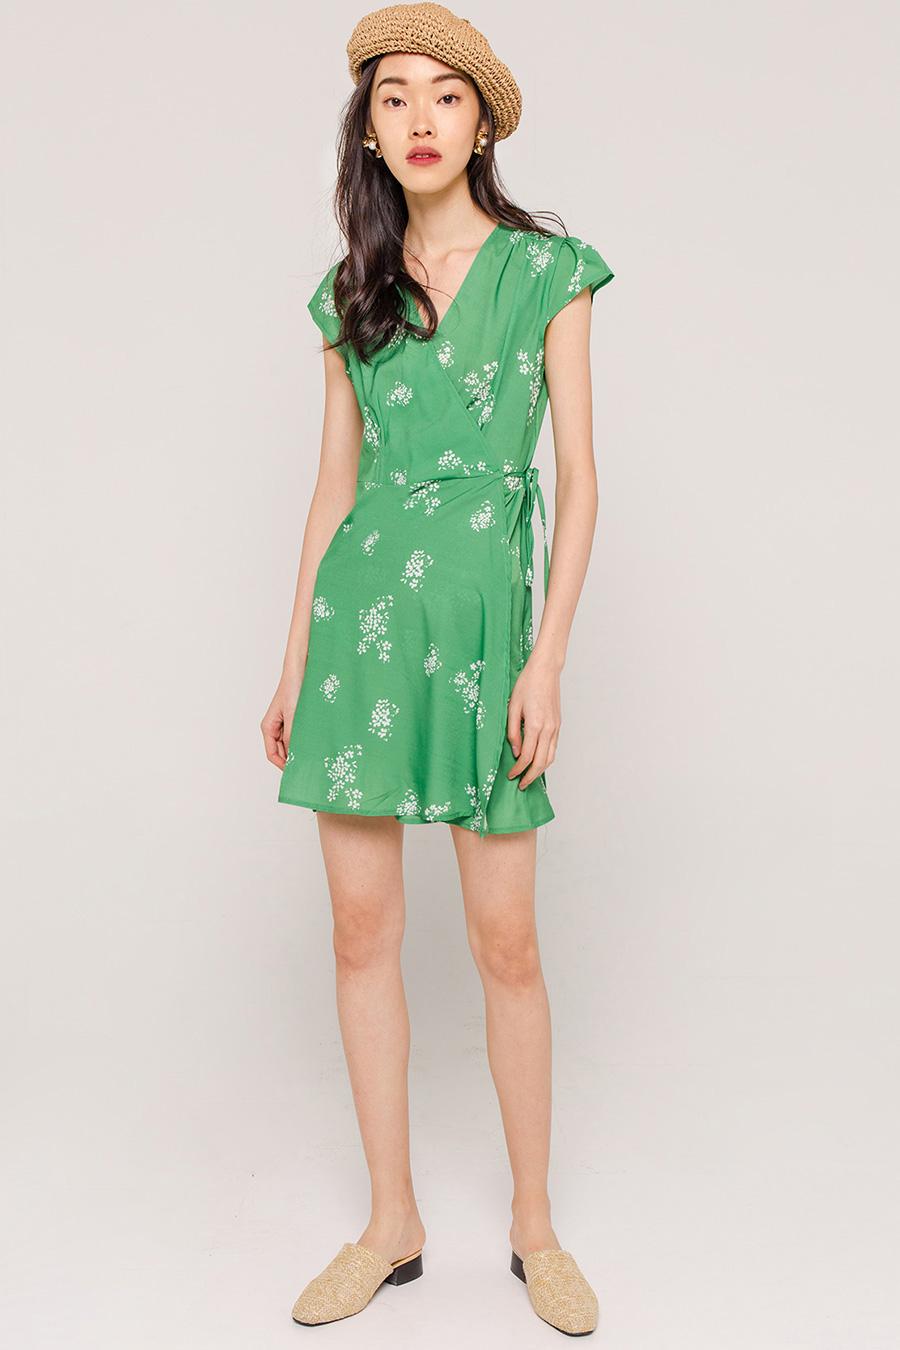 *SALE* FLORINE FLORAL WRAP DRESS - EMERALD GREEN